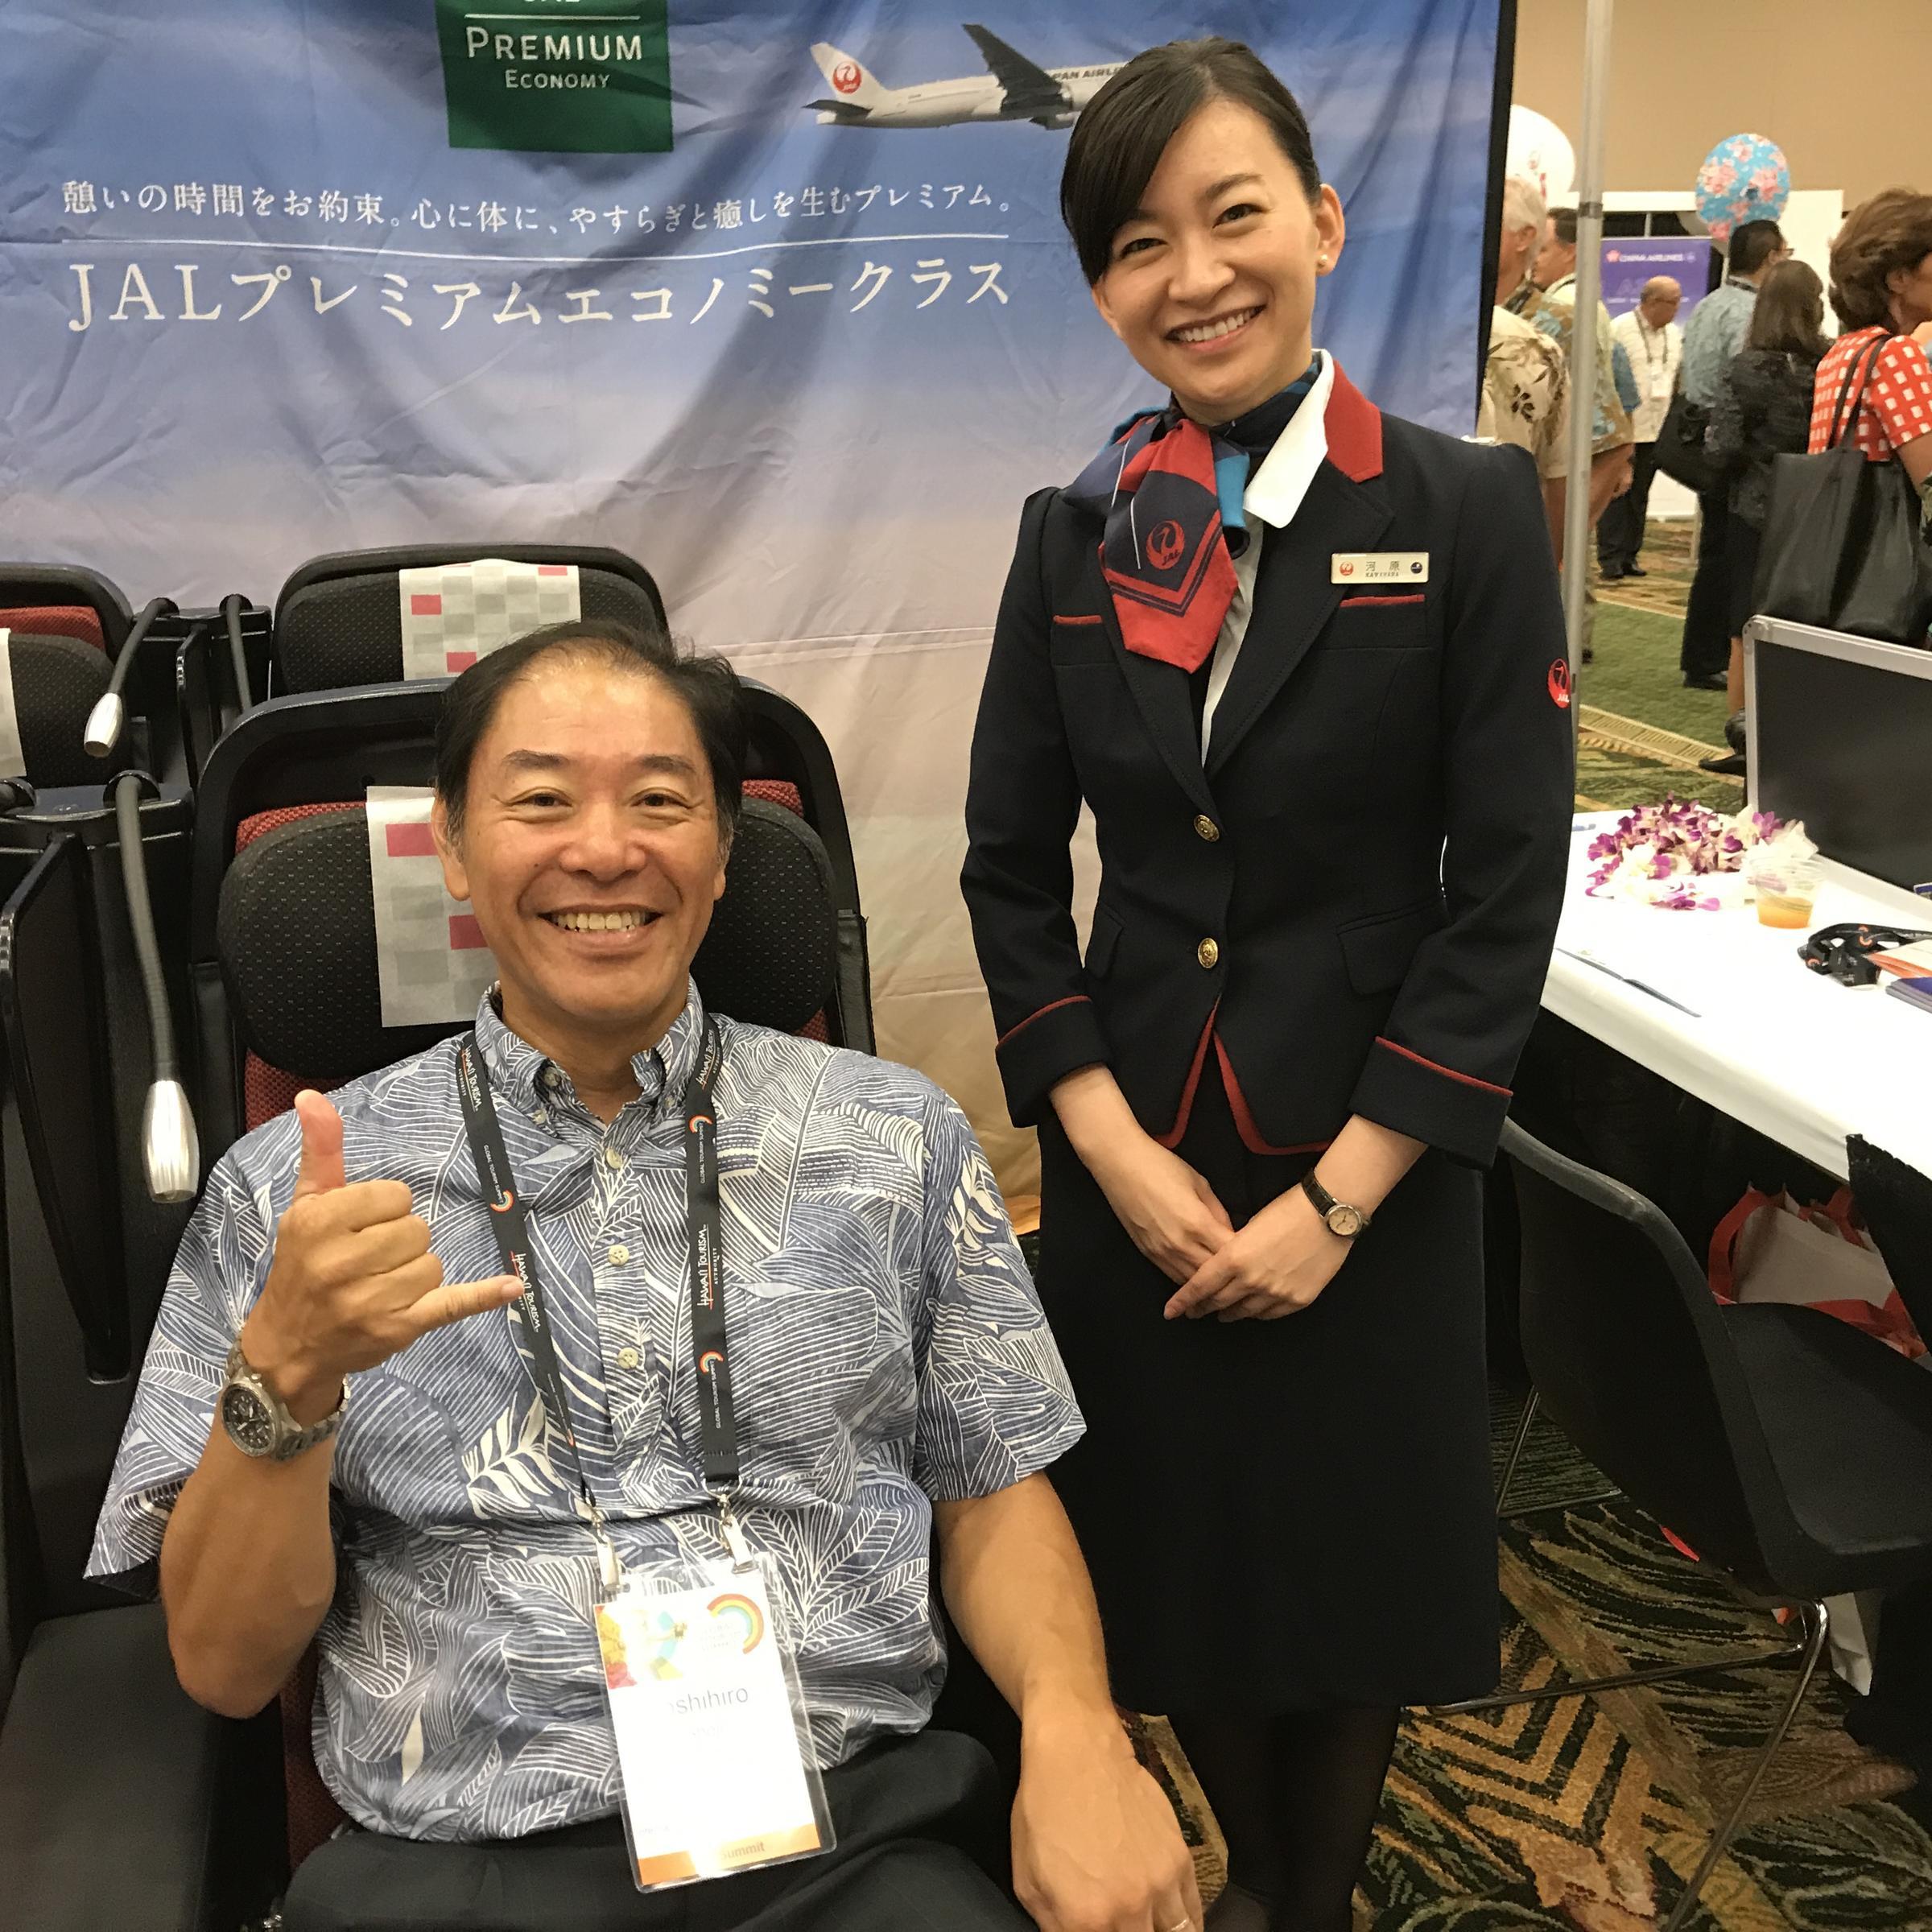 Global Tourism Summit: Japan #1 for Hawai'i   Hawaii